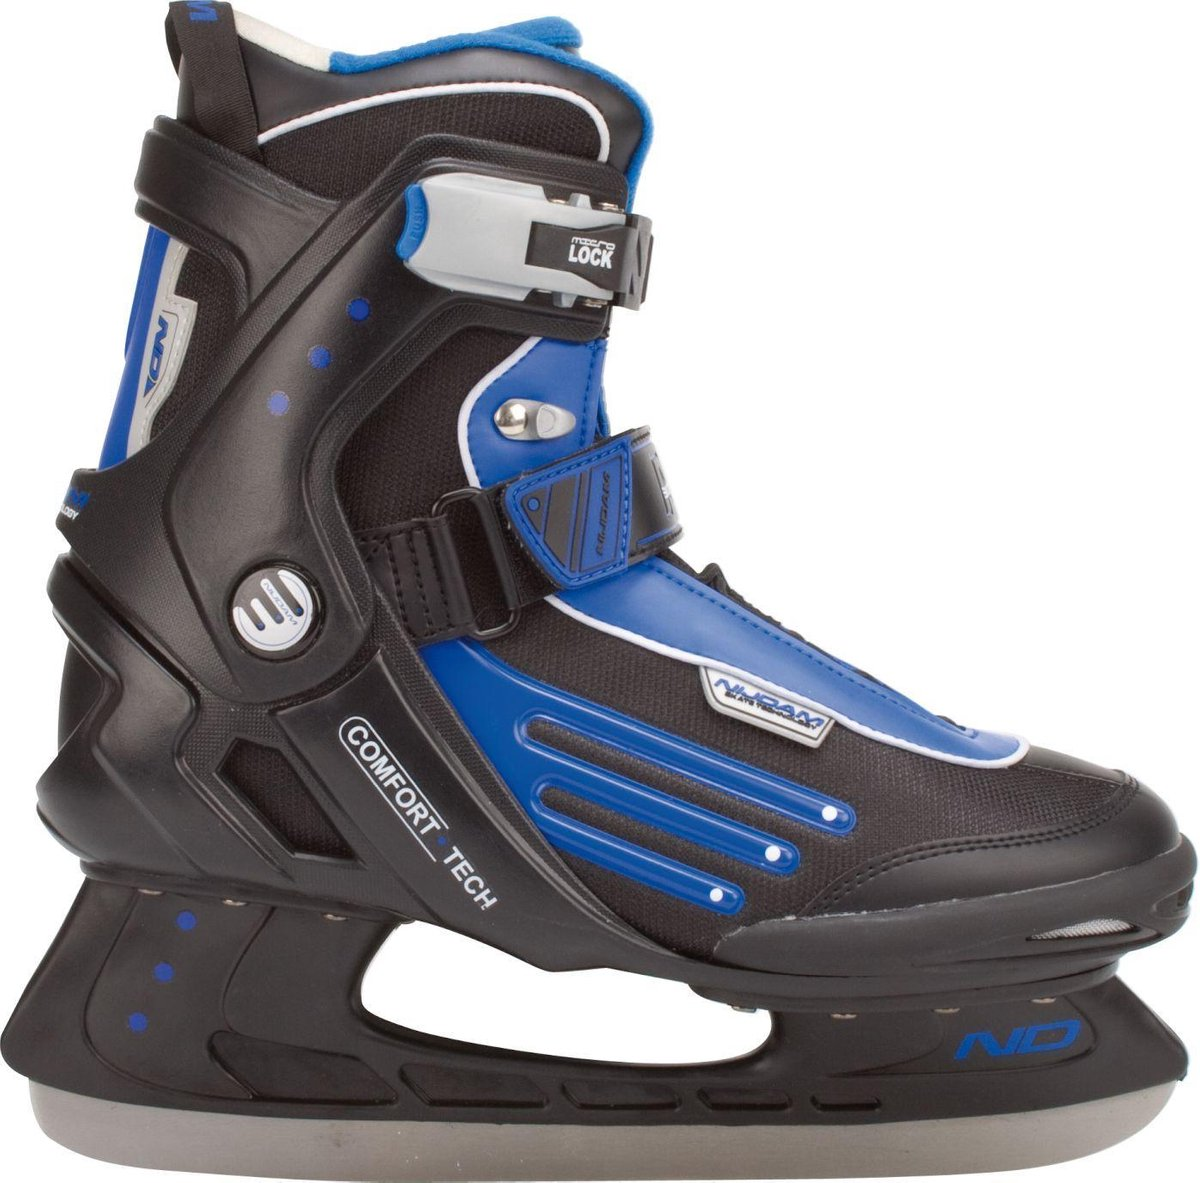 Nijdam IJshockeyschaats - Semi-Softboot - Zwart/Blauw/Zilver - 39